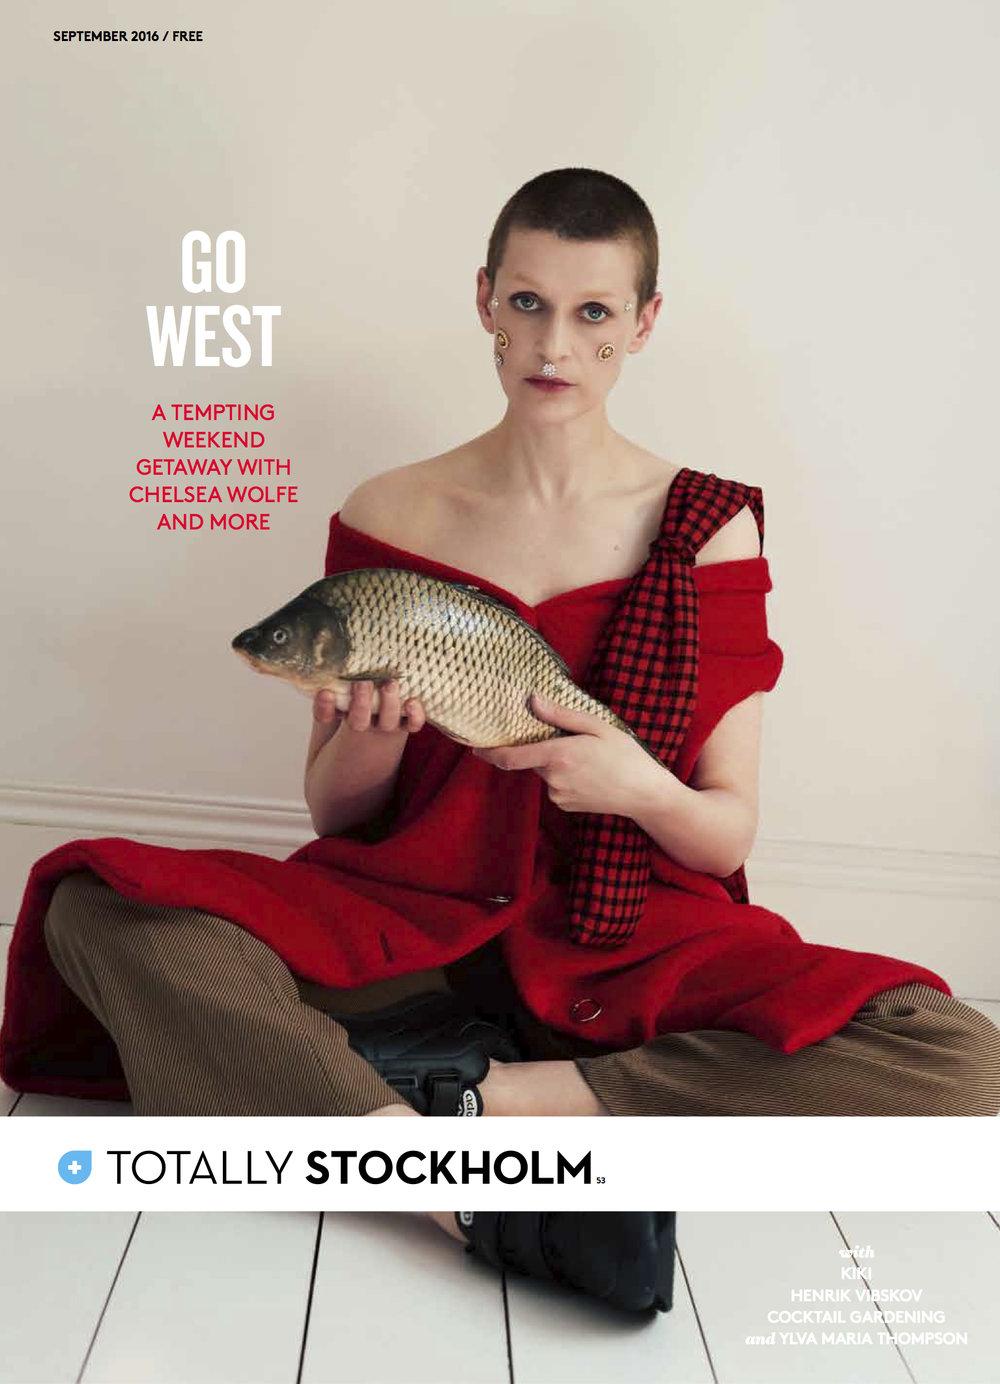 Omslag Totally Stockholm september 2016 - El Perro Del Mar.jpg